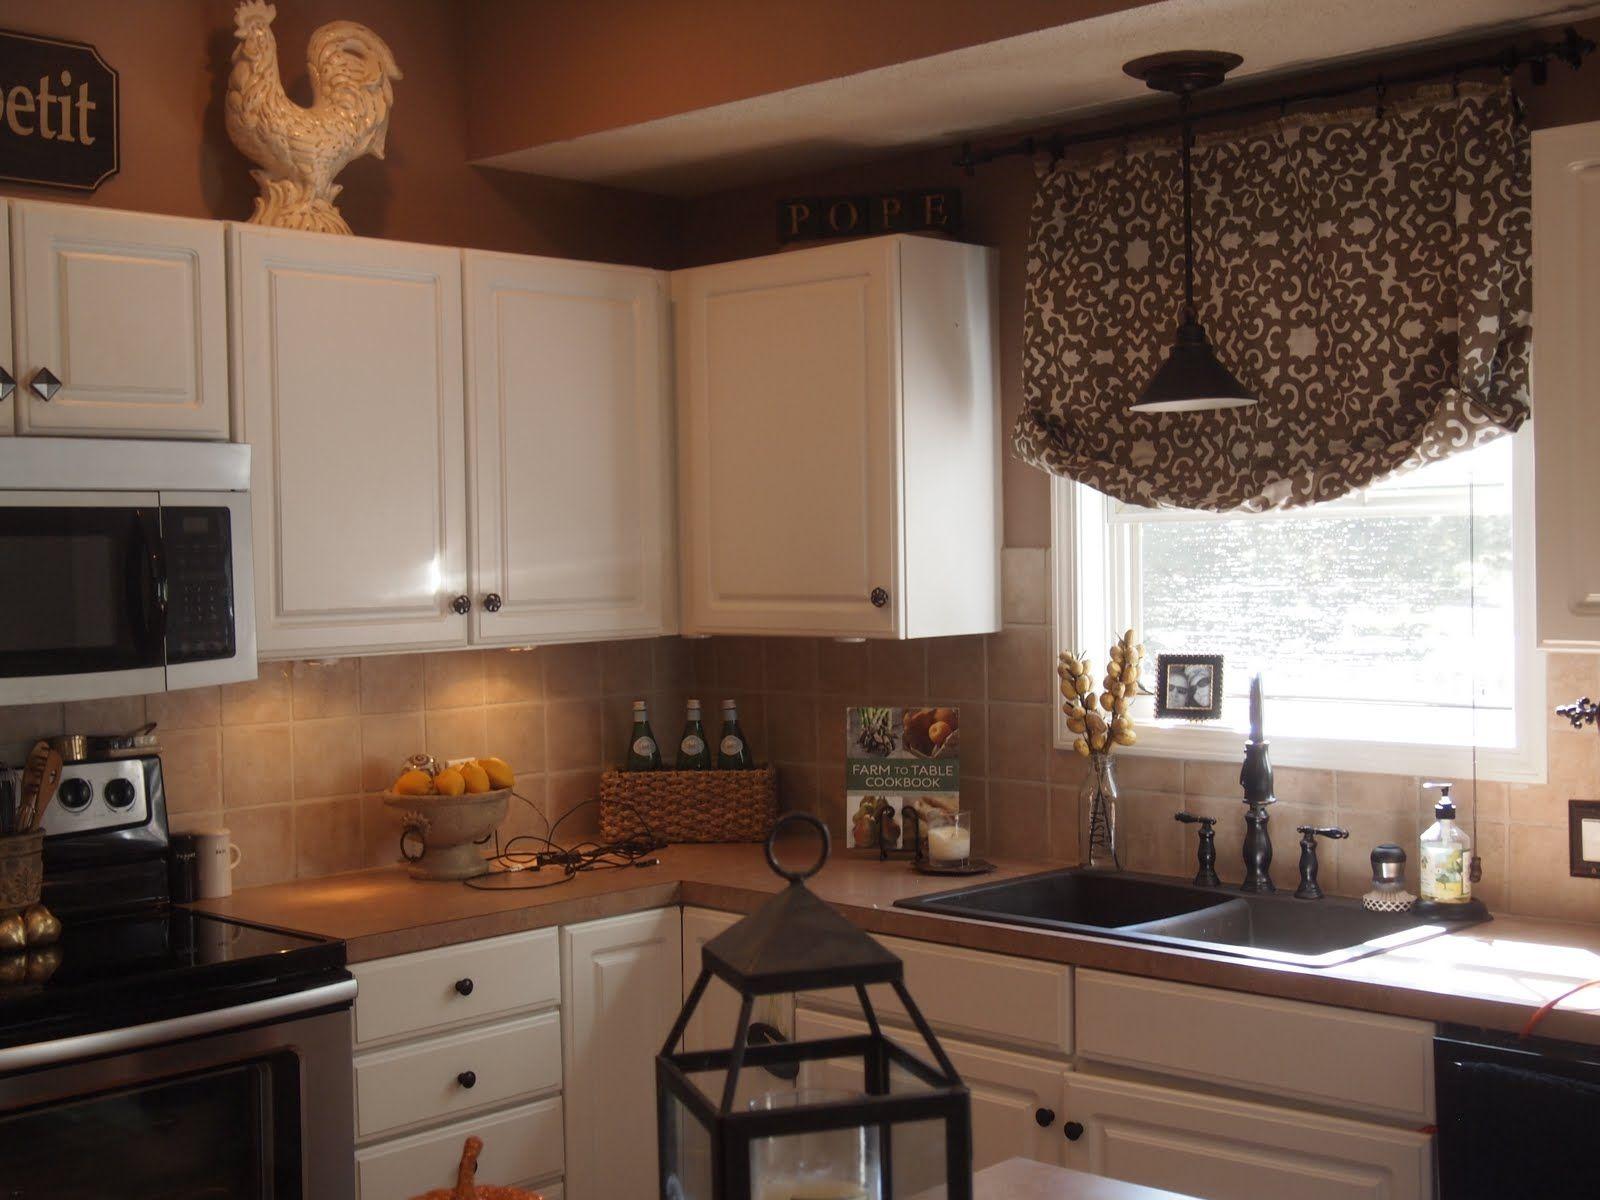 Kitchen Sink Valance Lighting Http Sinhvienthienan & Kitchen Valance Lighting - Kitchen Design Ideas azcodes.com